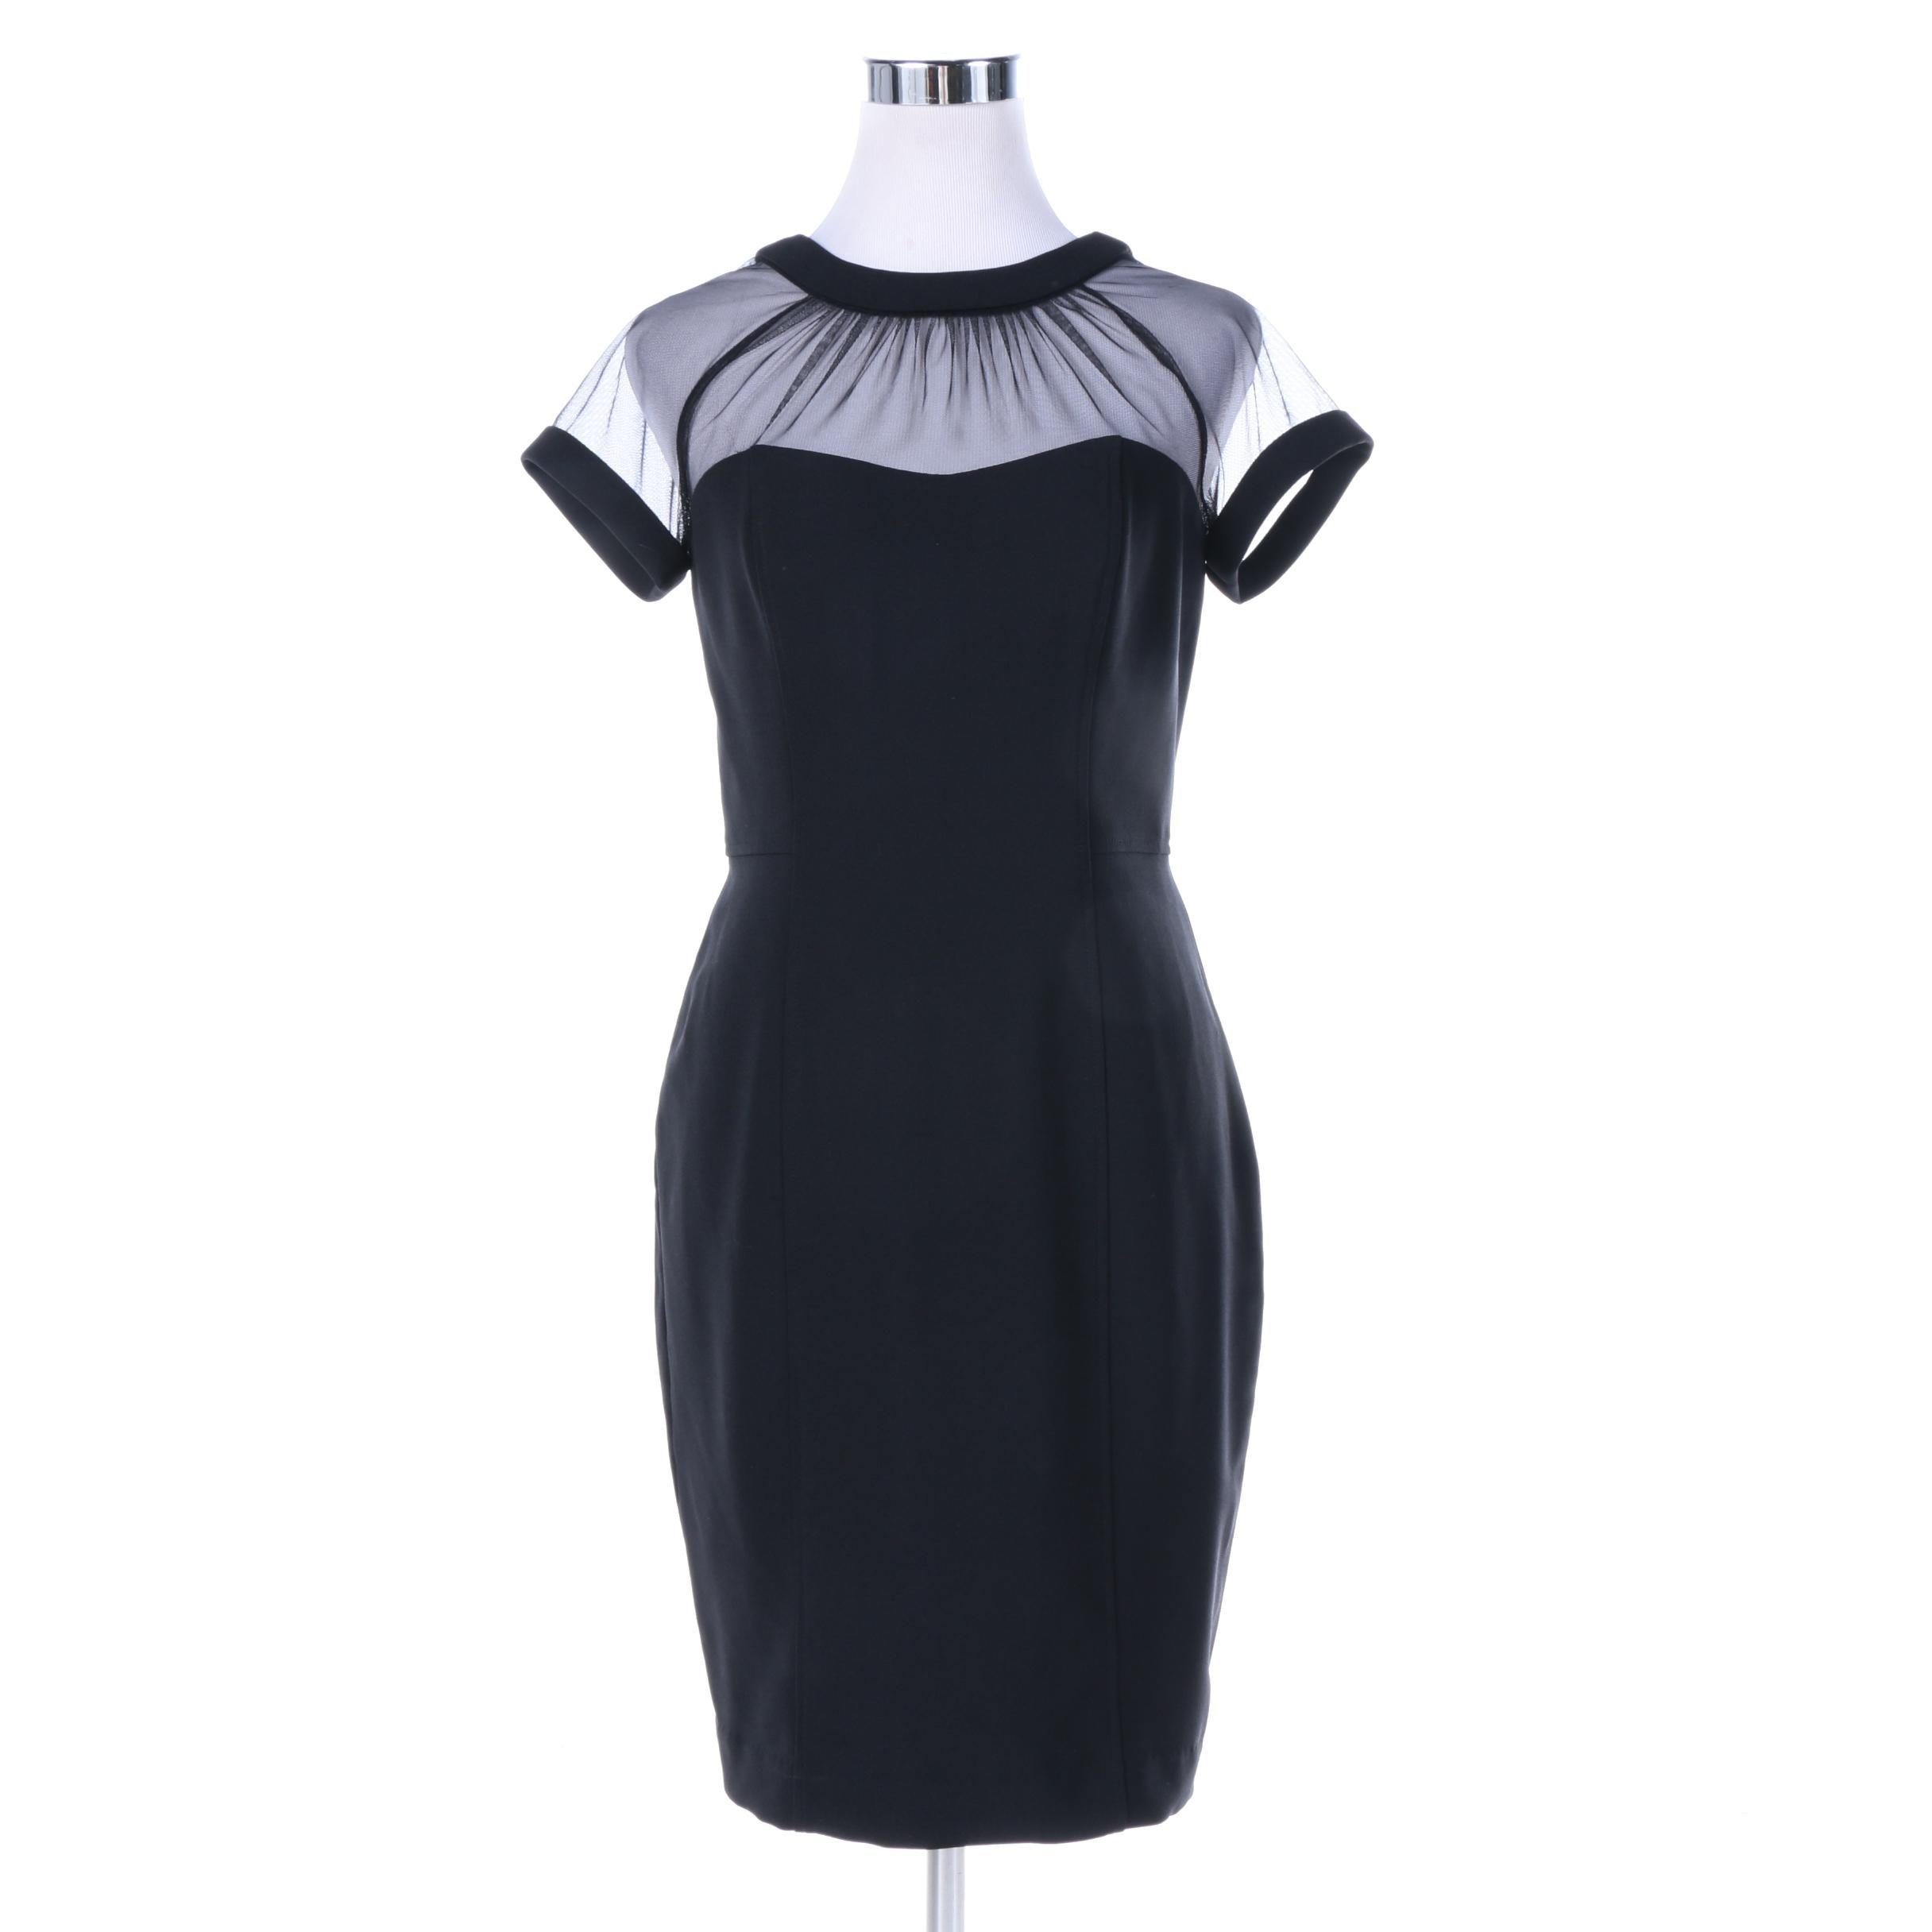 Maggy London Petites Black Poly Blend Cocktail Dress